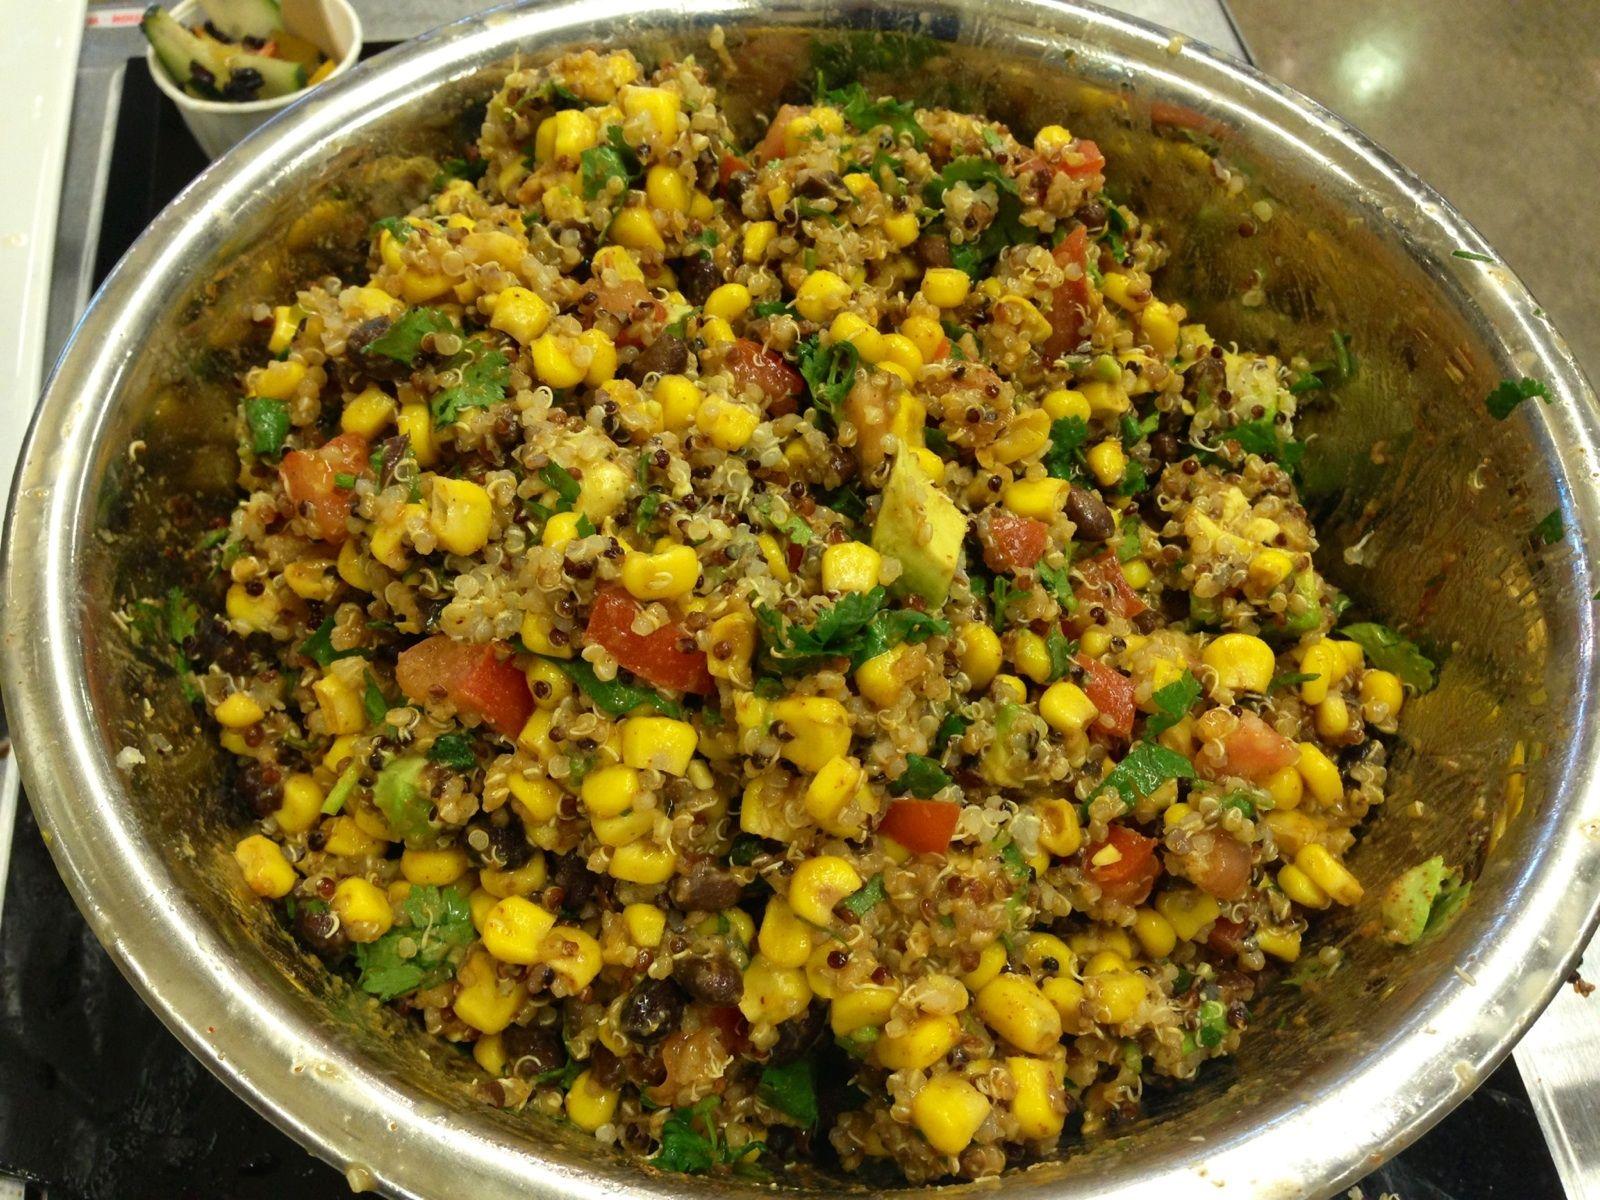 Tex mex quinoa salad recipes whole foods market cooking tex mex quinoa salad recipes whole foods market cooking fairfield forumfinder Images